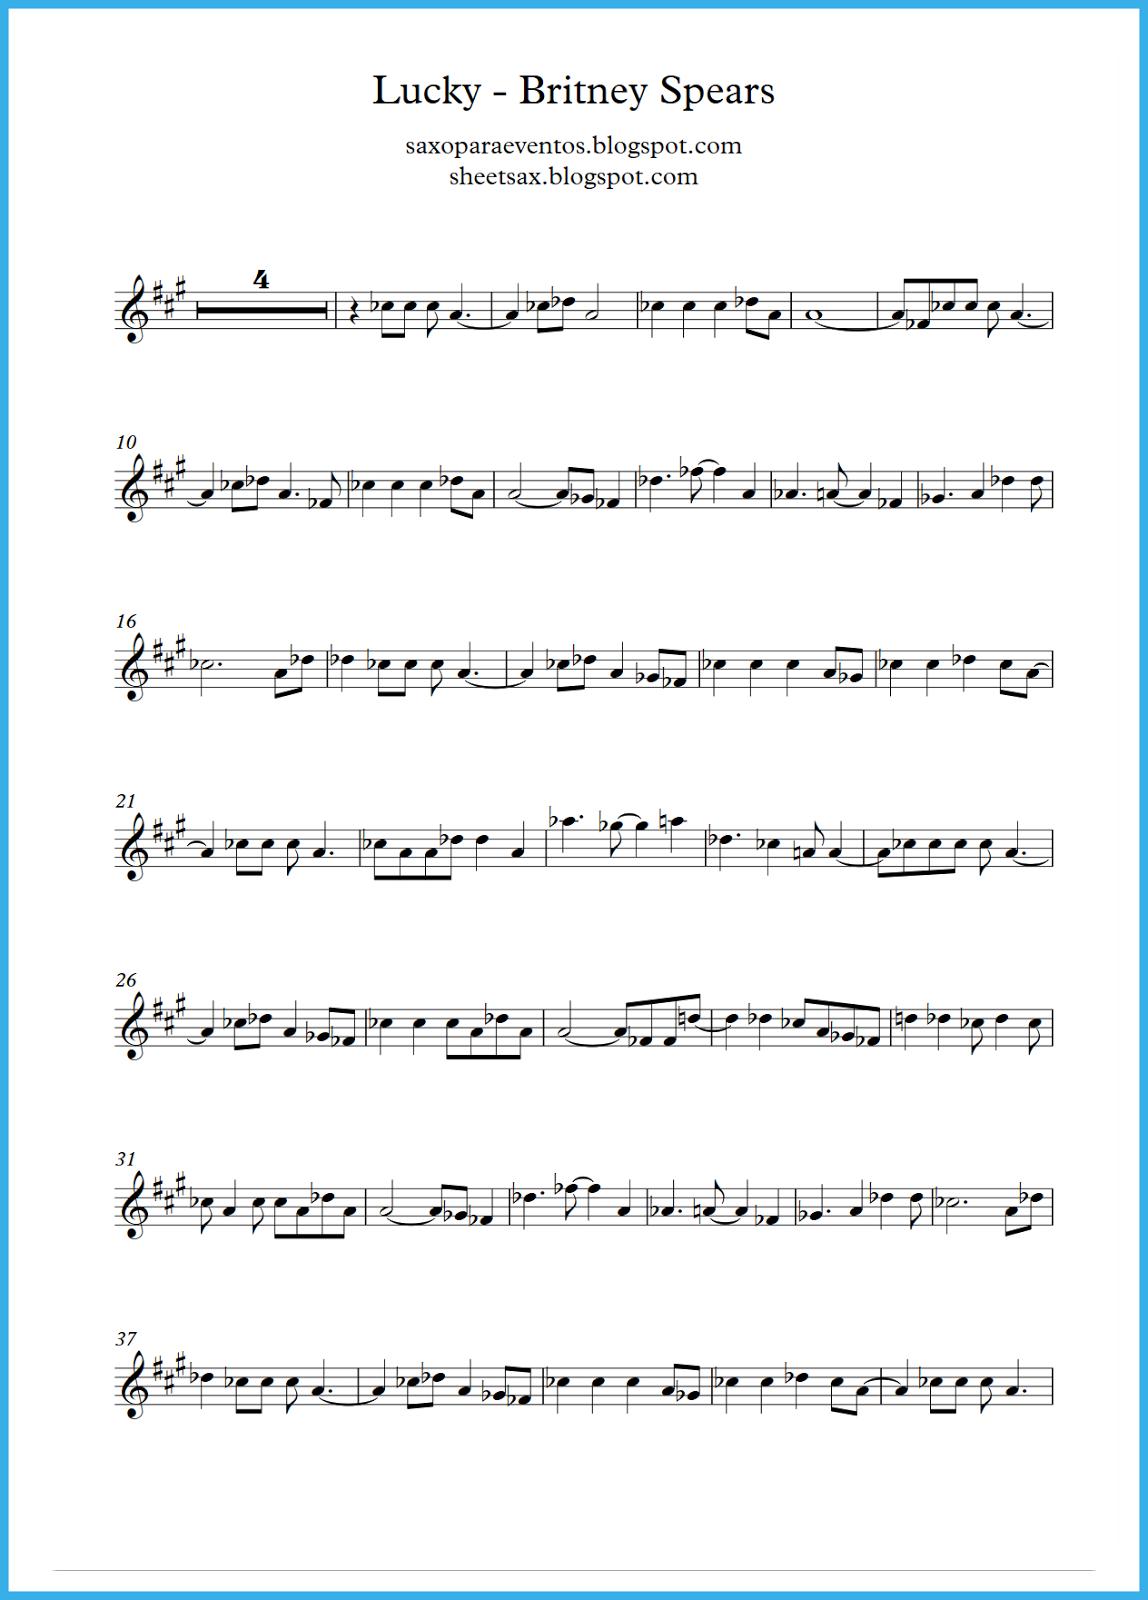 http://1.bp.blogspot.com/-6G8sJzHoK2Q/USw9qtTmM3I/AAAAAAAADT8/JEJyJtZrIwI/s1600/Lucky+-+Britney+Spears+-+sheet+for+alto+sax,+trumpet,+clarinet+-+partitura+saxo+alto,+trompeta,+clarinete_0001.png